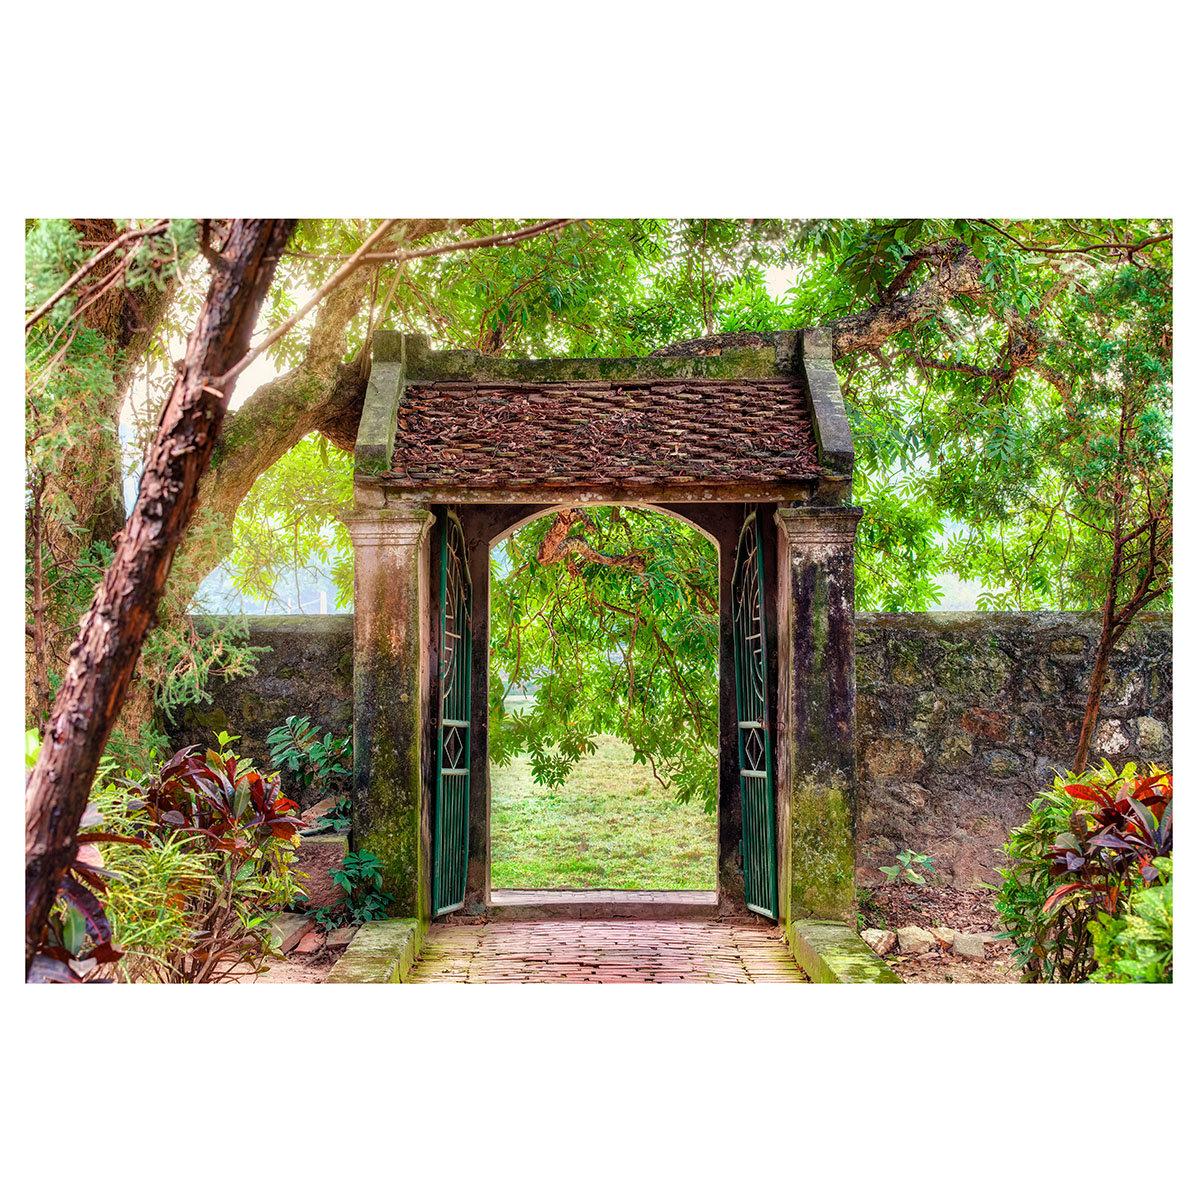 Gartenposter Pforte 210 x 150 cm